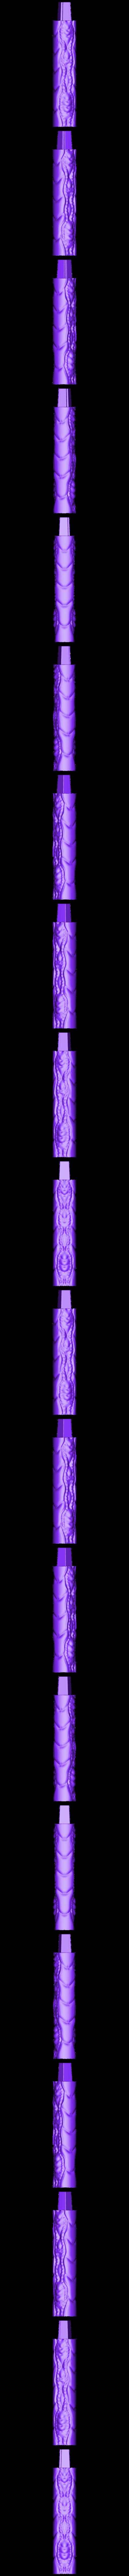 Aquaman_weapon_11.stl Download STL file Aquaman Trident Cosplay STL files - Costume Weapons 3D Printing • 3D printing design, 3DPrintModelStoreSS